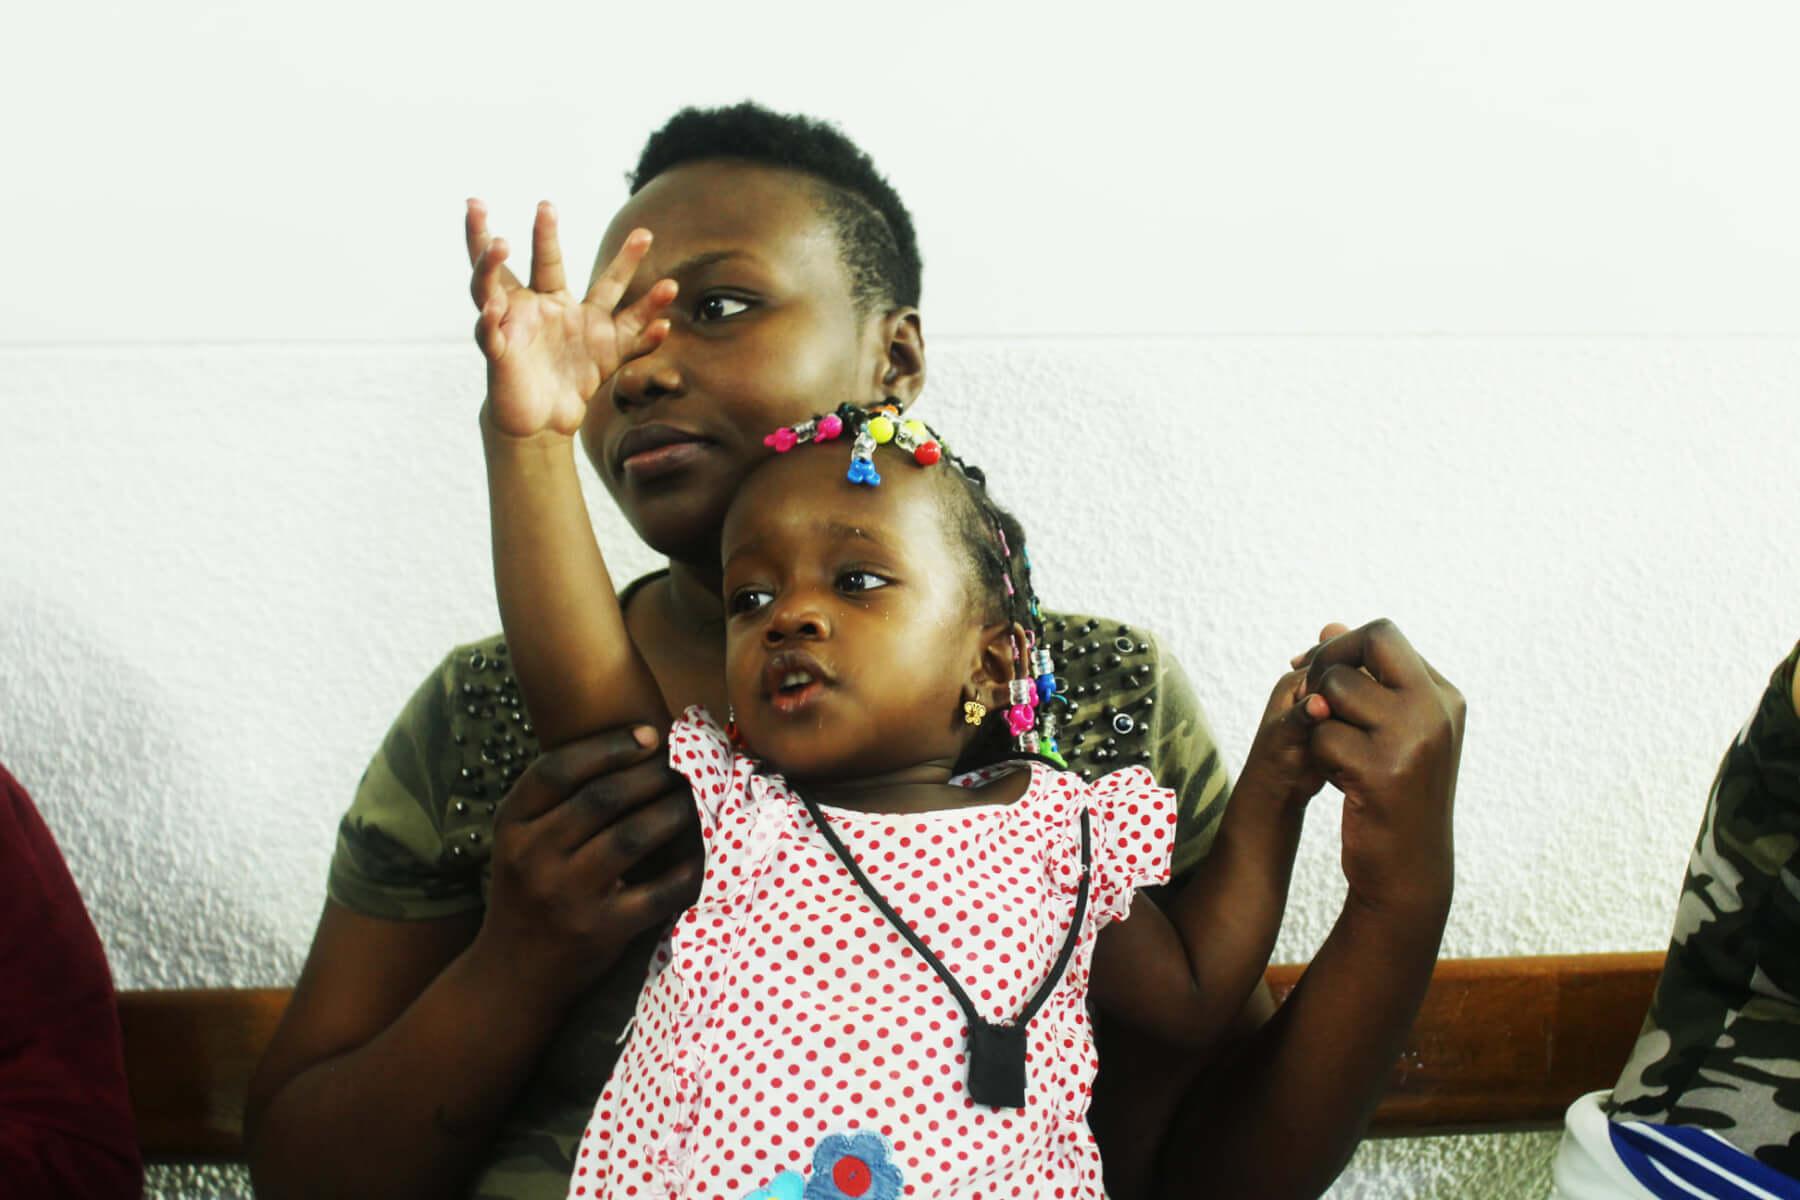 La Historia de Keily Jordán (Caso de Ortopedia Infantil)